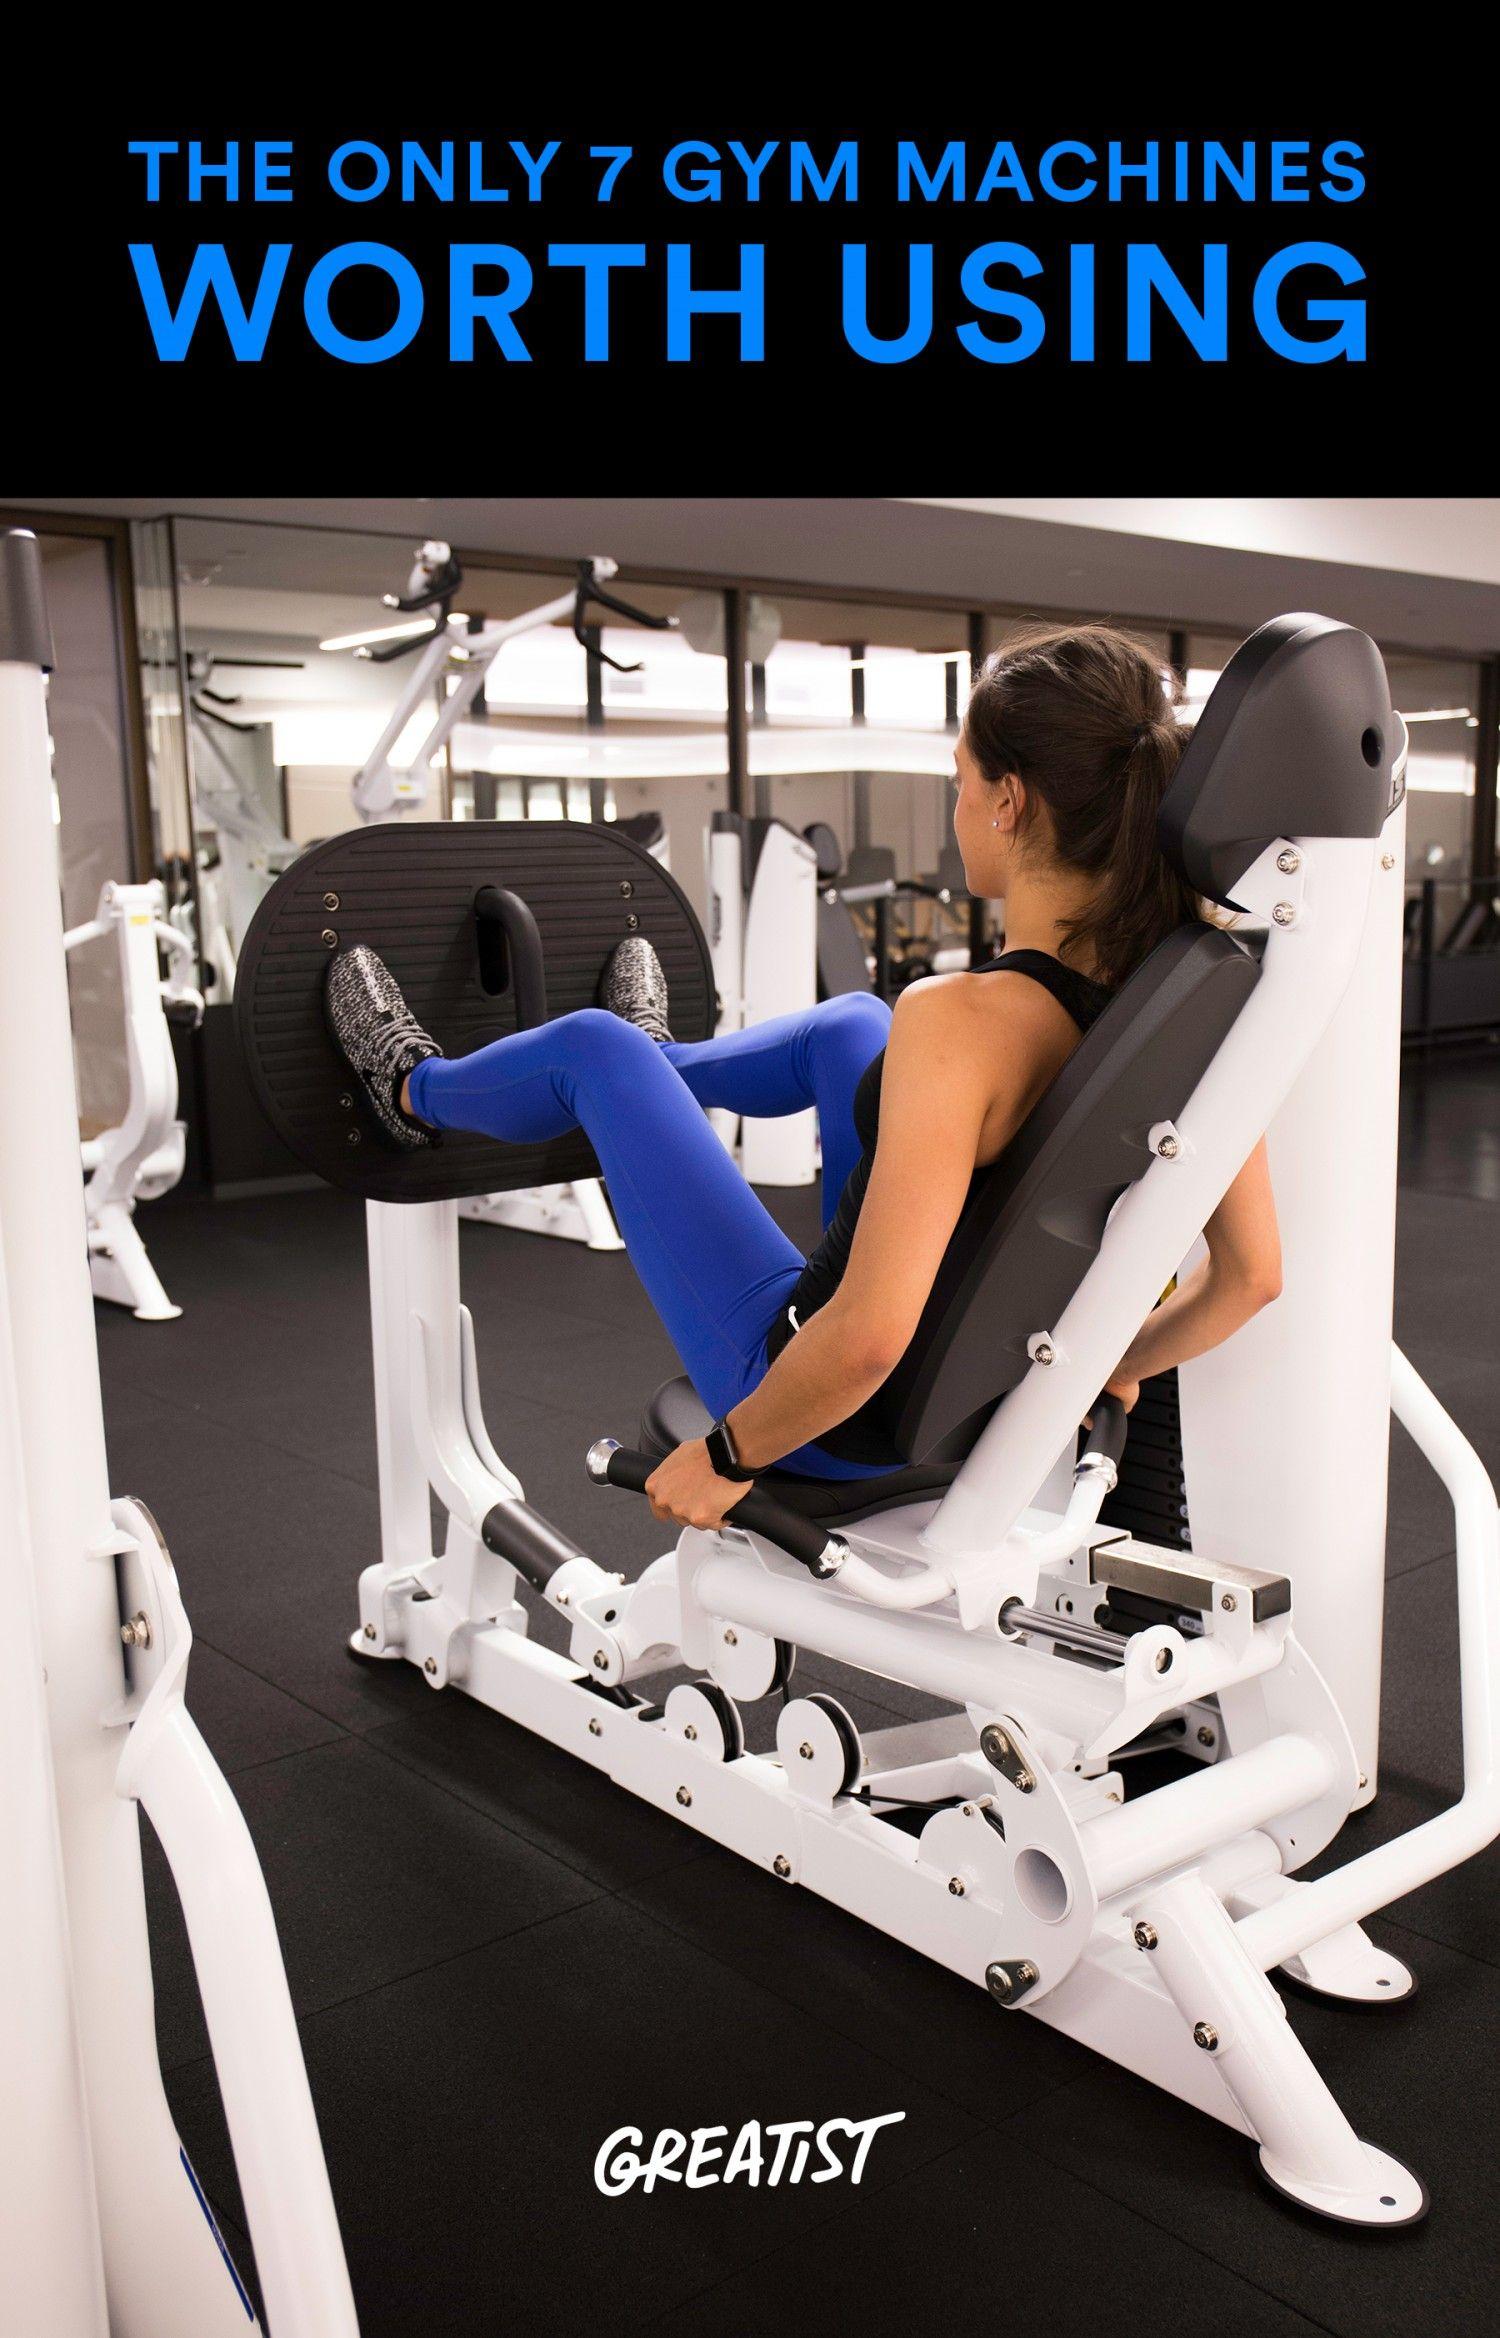 10 sportschool fitness gym ideas